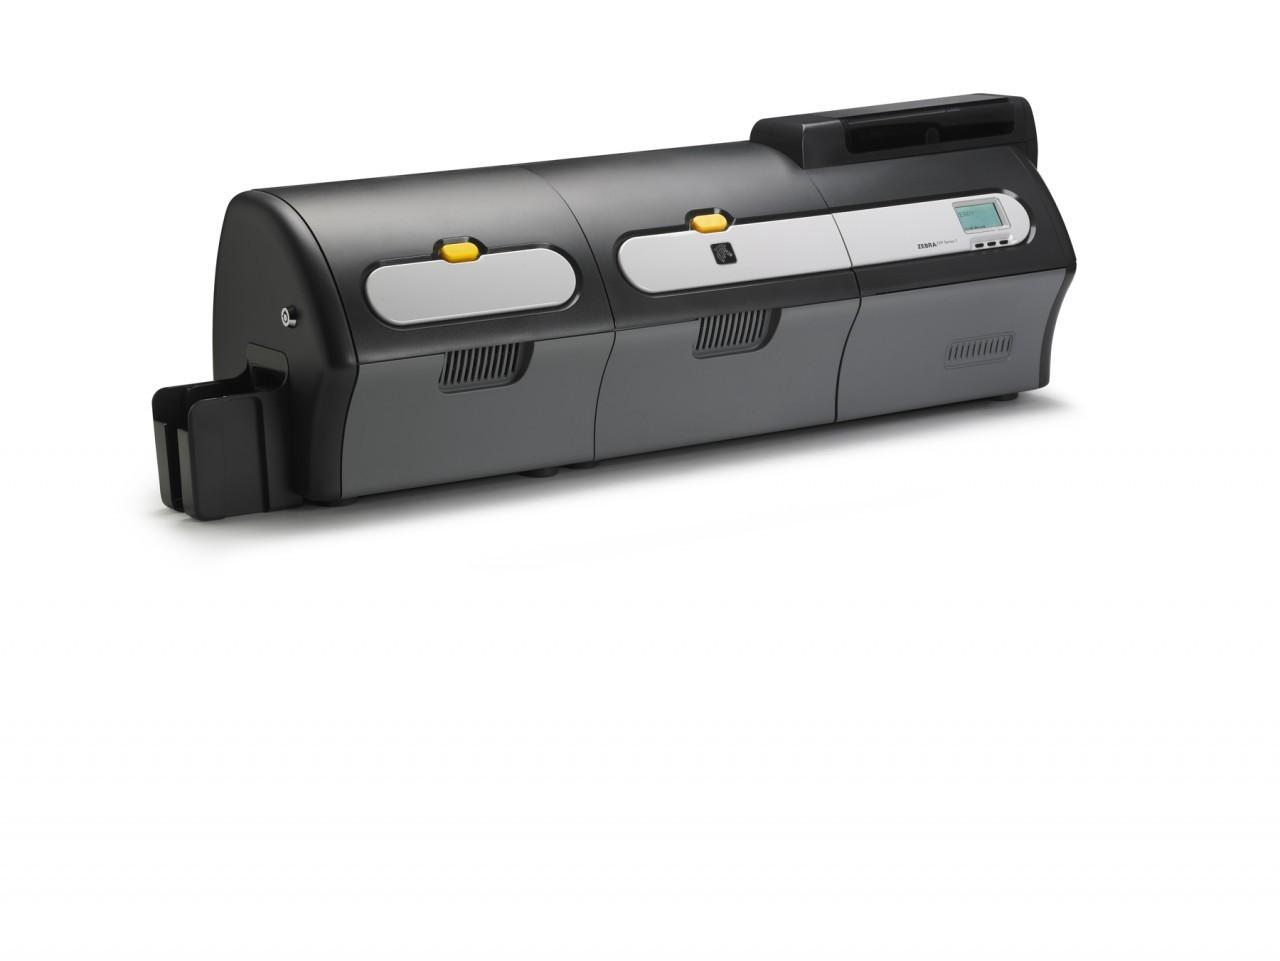 Zebra ZXP 7 - Impressora de Cartões